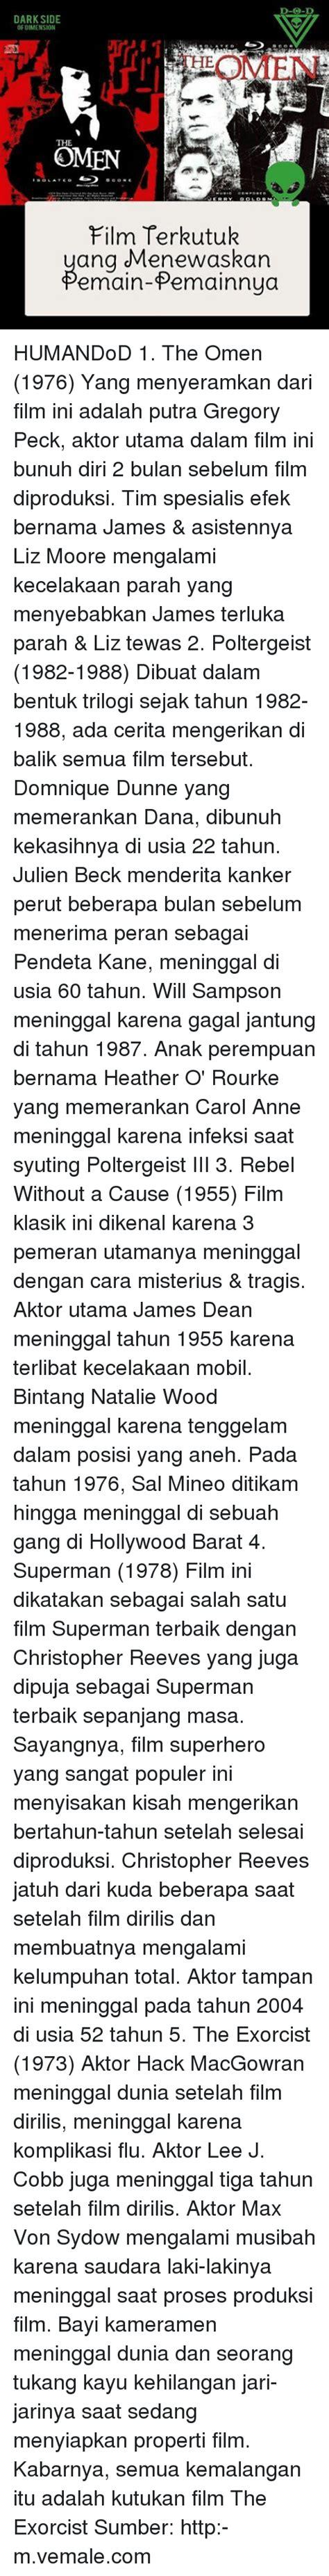 kutukan film exorcist 25 best memes about poltergeist 1982 poltergeist 1982 memes